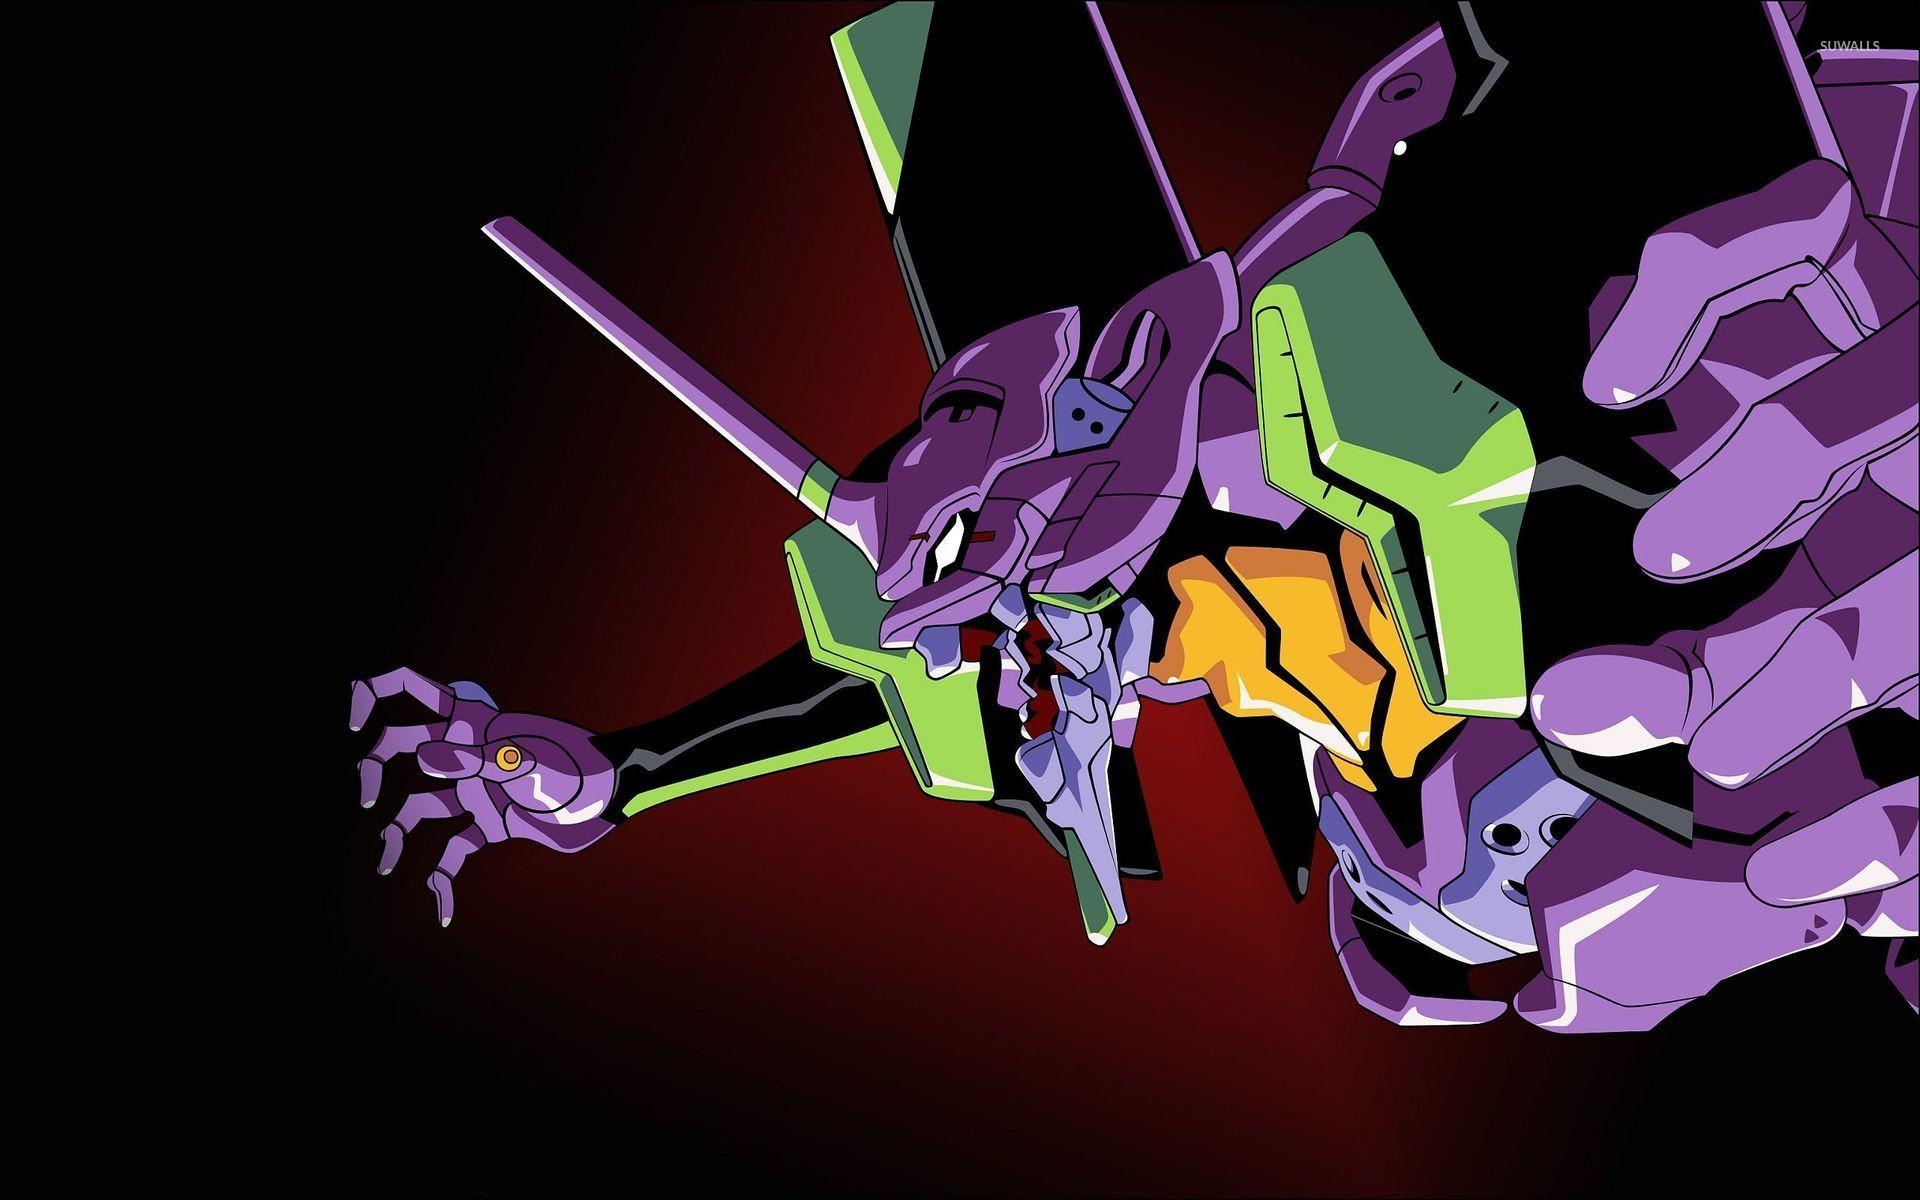 Neon Genesis Evangelion wallpaper – Anime wallpapers – #8846